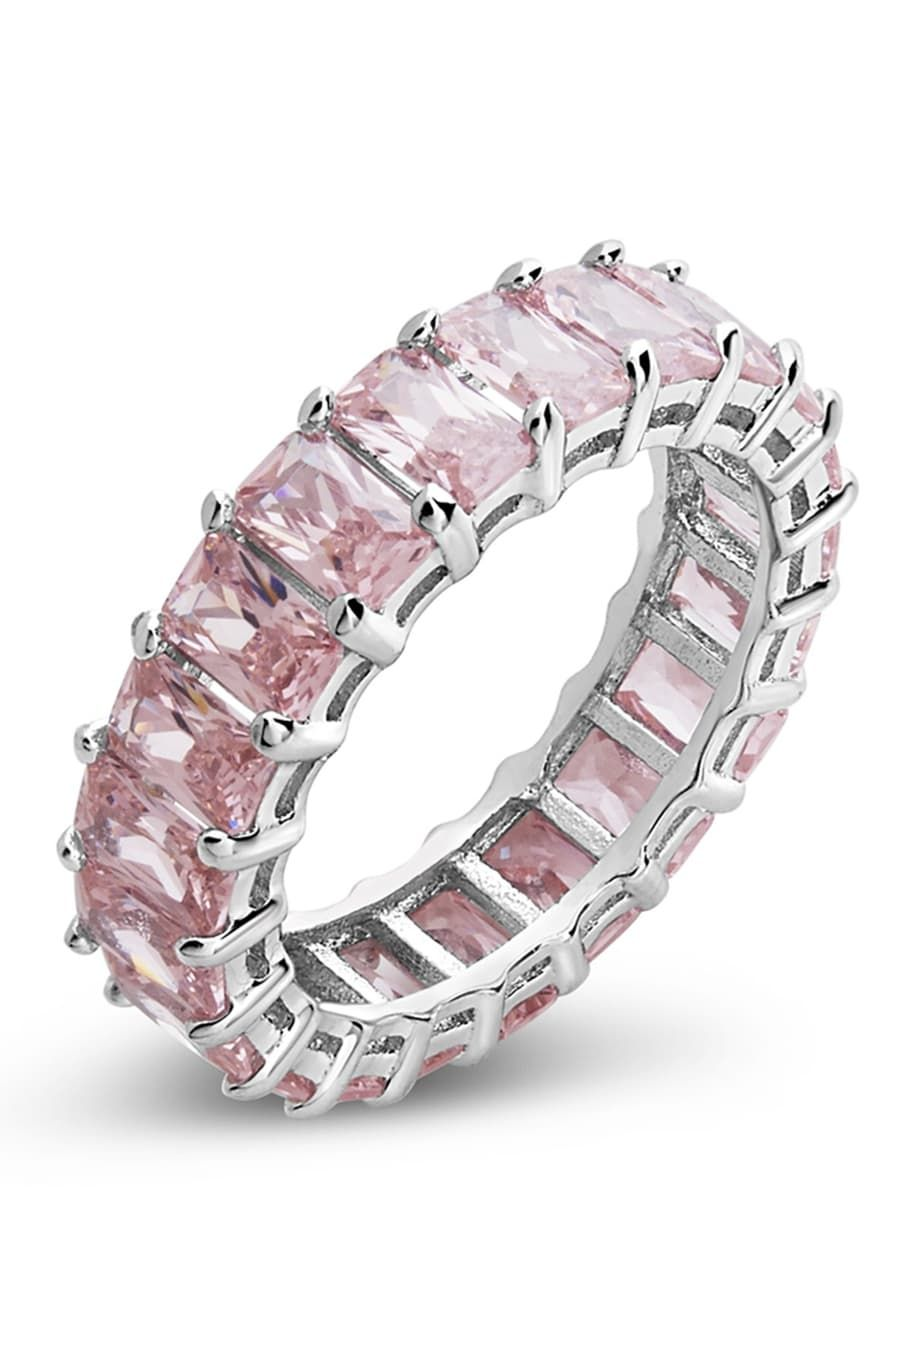 21+ Nordstrom rack clearance fine jewelry info